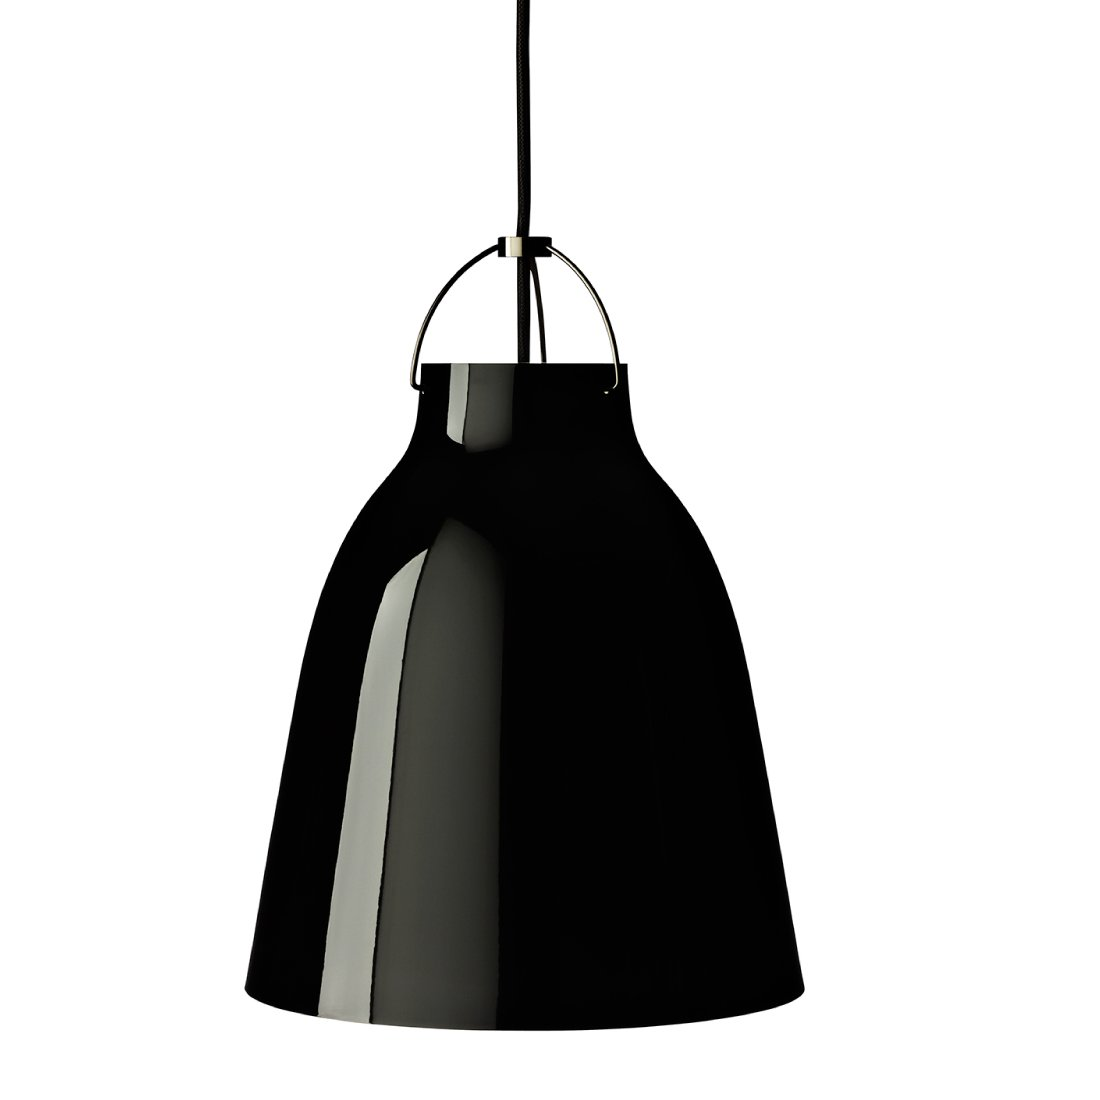 Lightyears Caravaggio P2 Hoogglans Zwart - Zwart